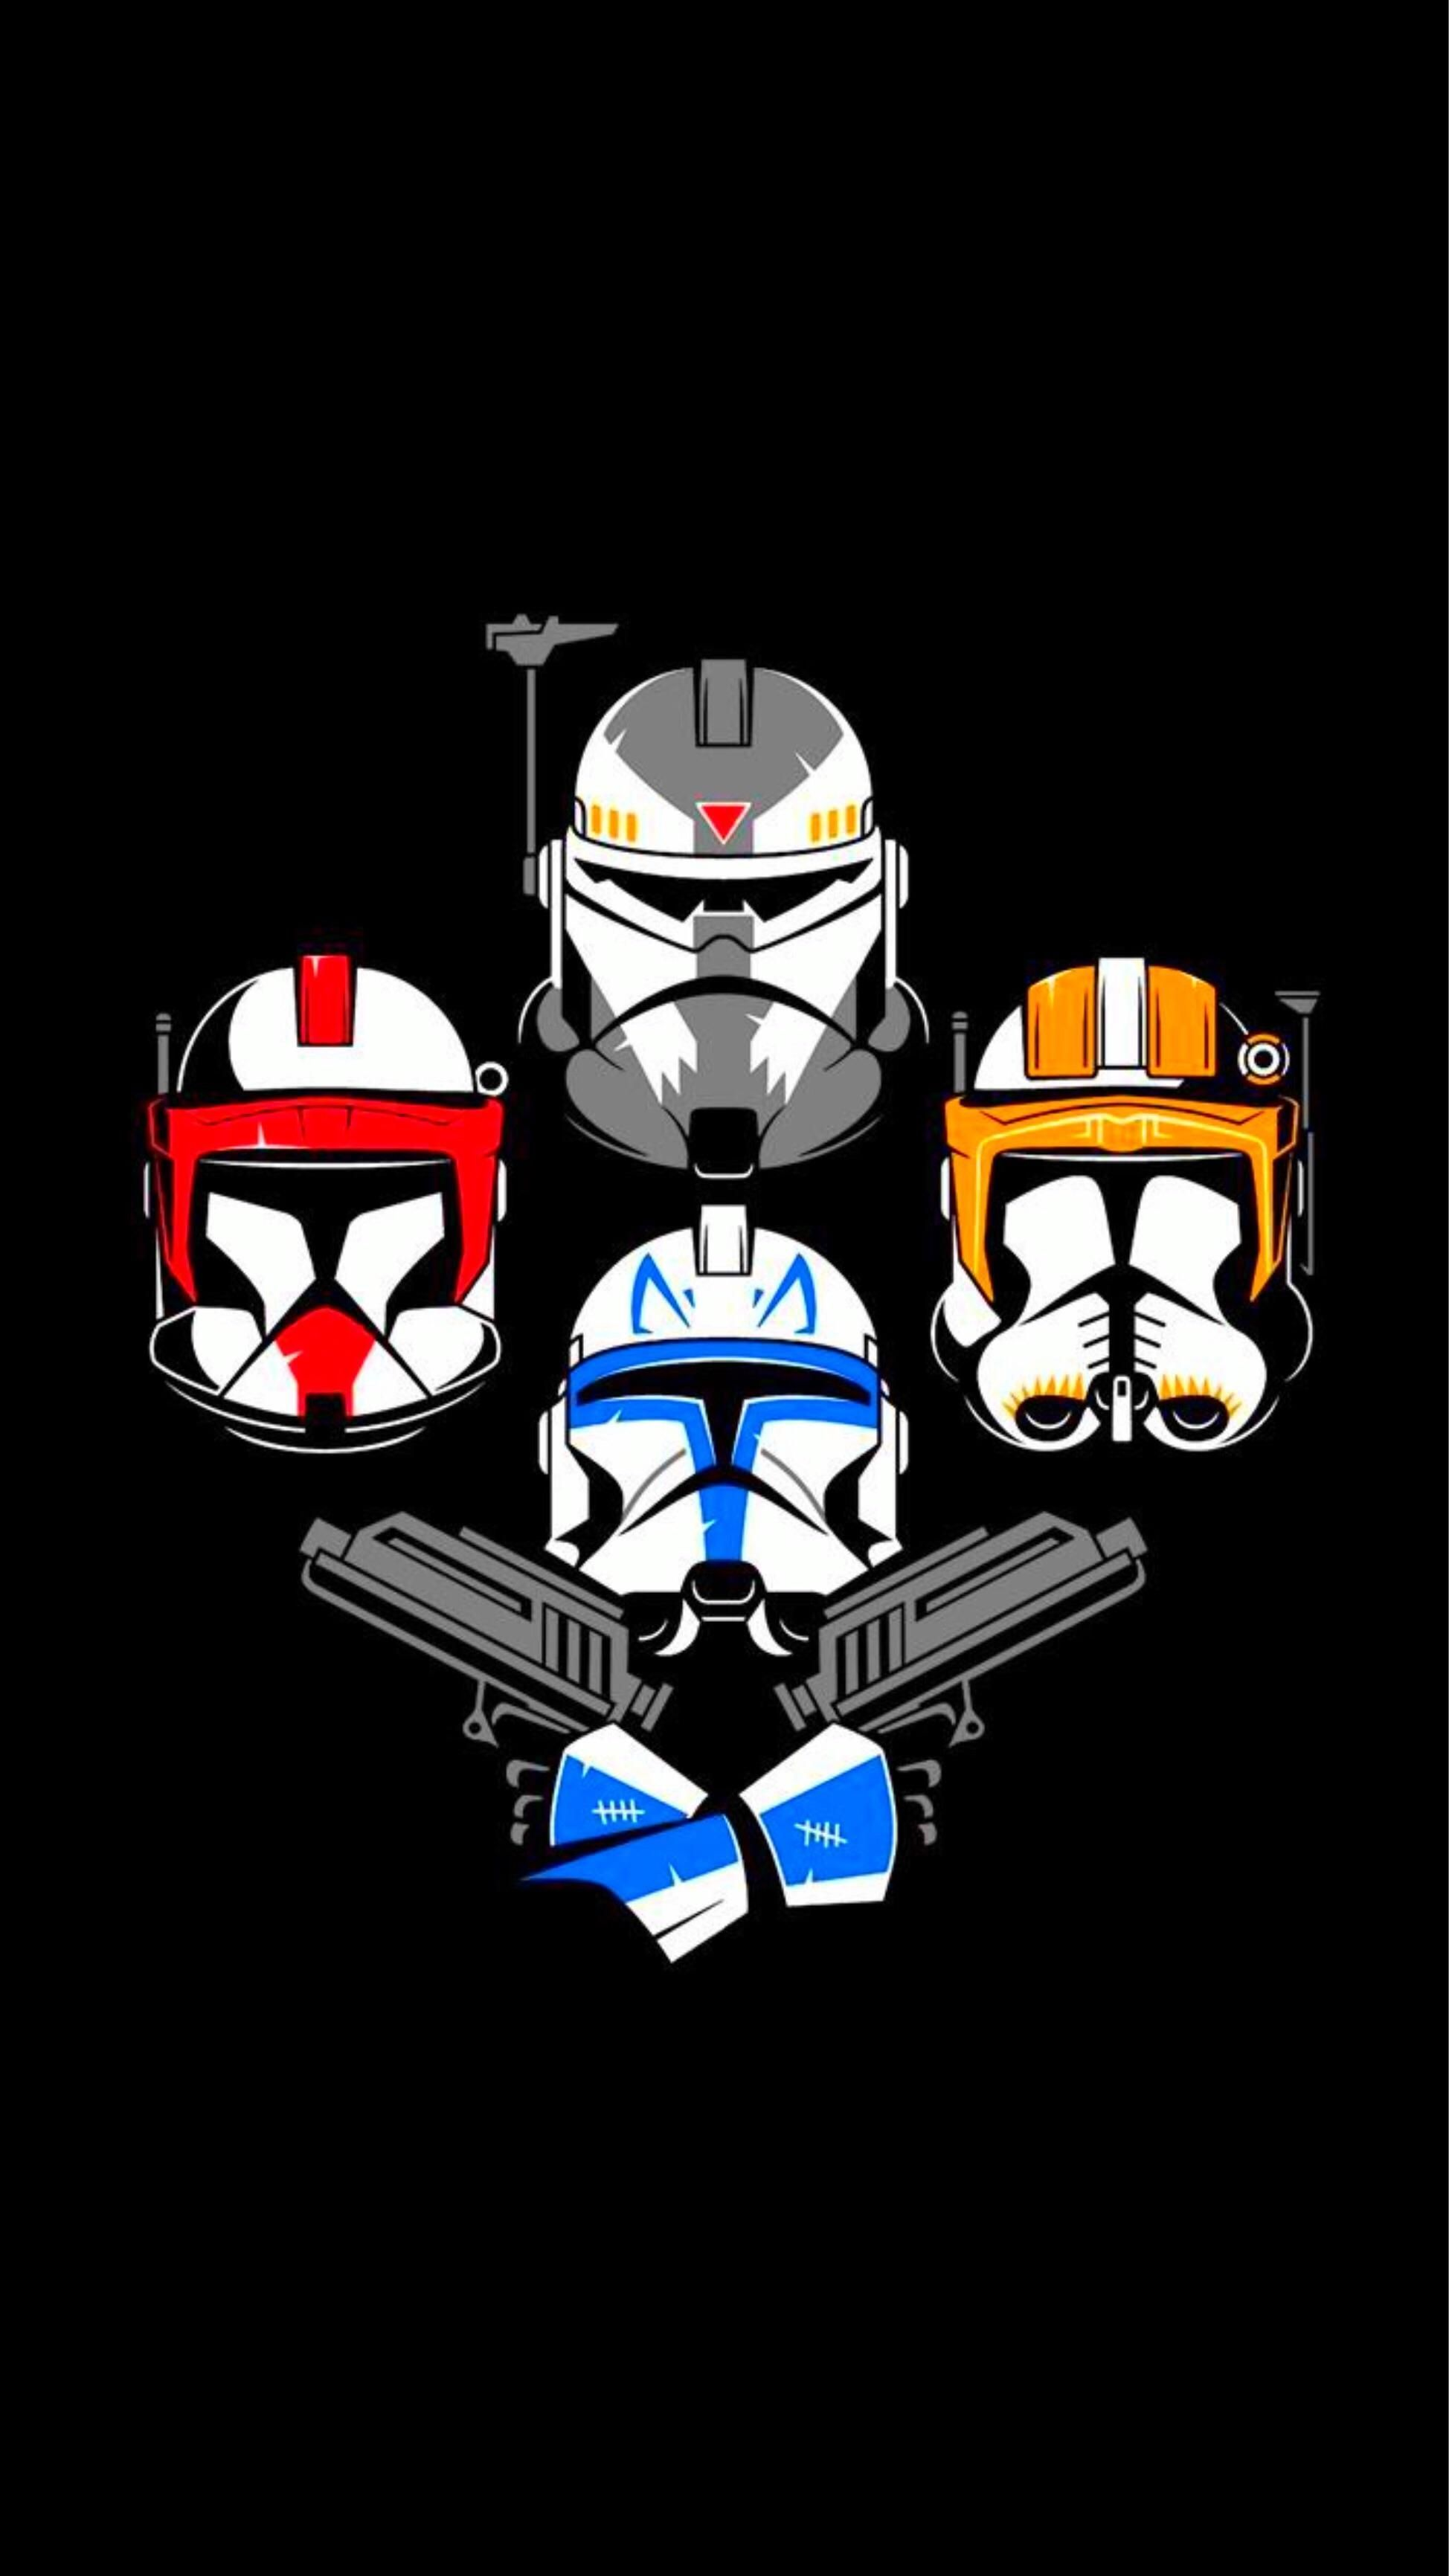 Clone Trooper Helmet Wallpapers Wallpaper Cave